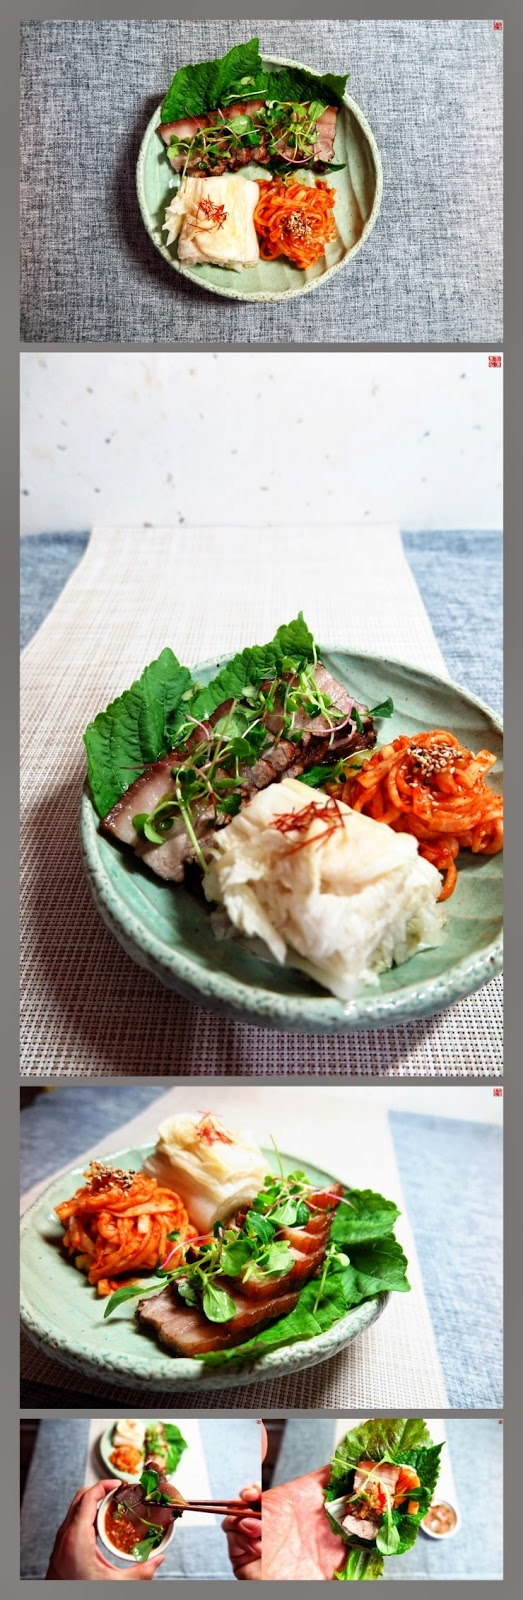 Korean recipes blog danielland steamed porkkorean recipes korean recipes blog danielland steamed porkkorean recipeskorean food forumfinder Image collections